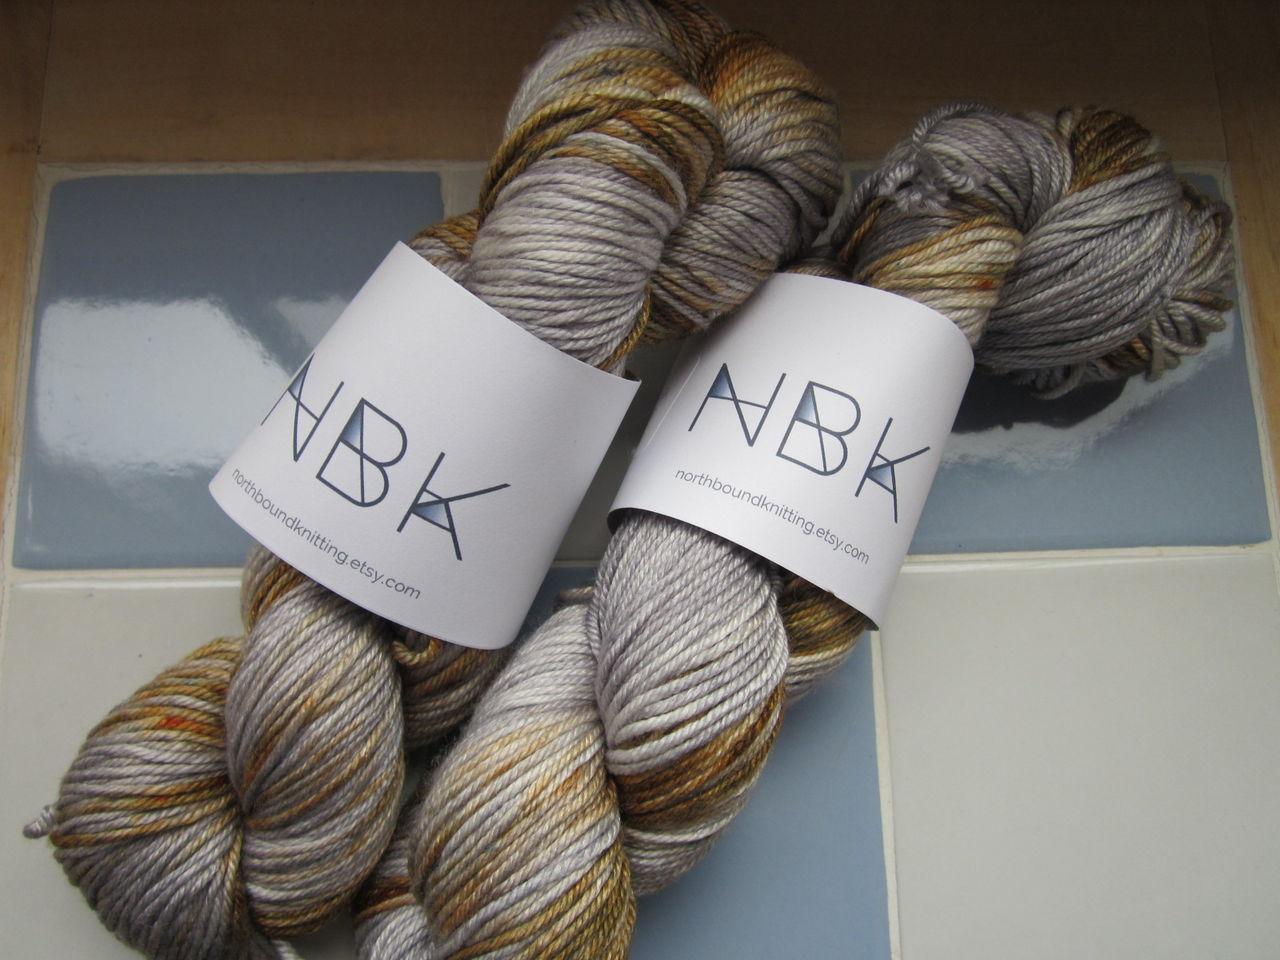 Northbound Knitting : Northbound Knitting?Silk/Merino DK???????? : ????Blog